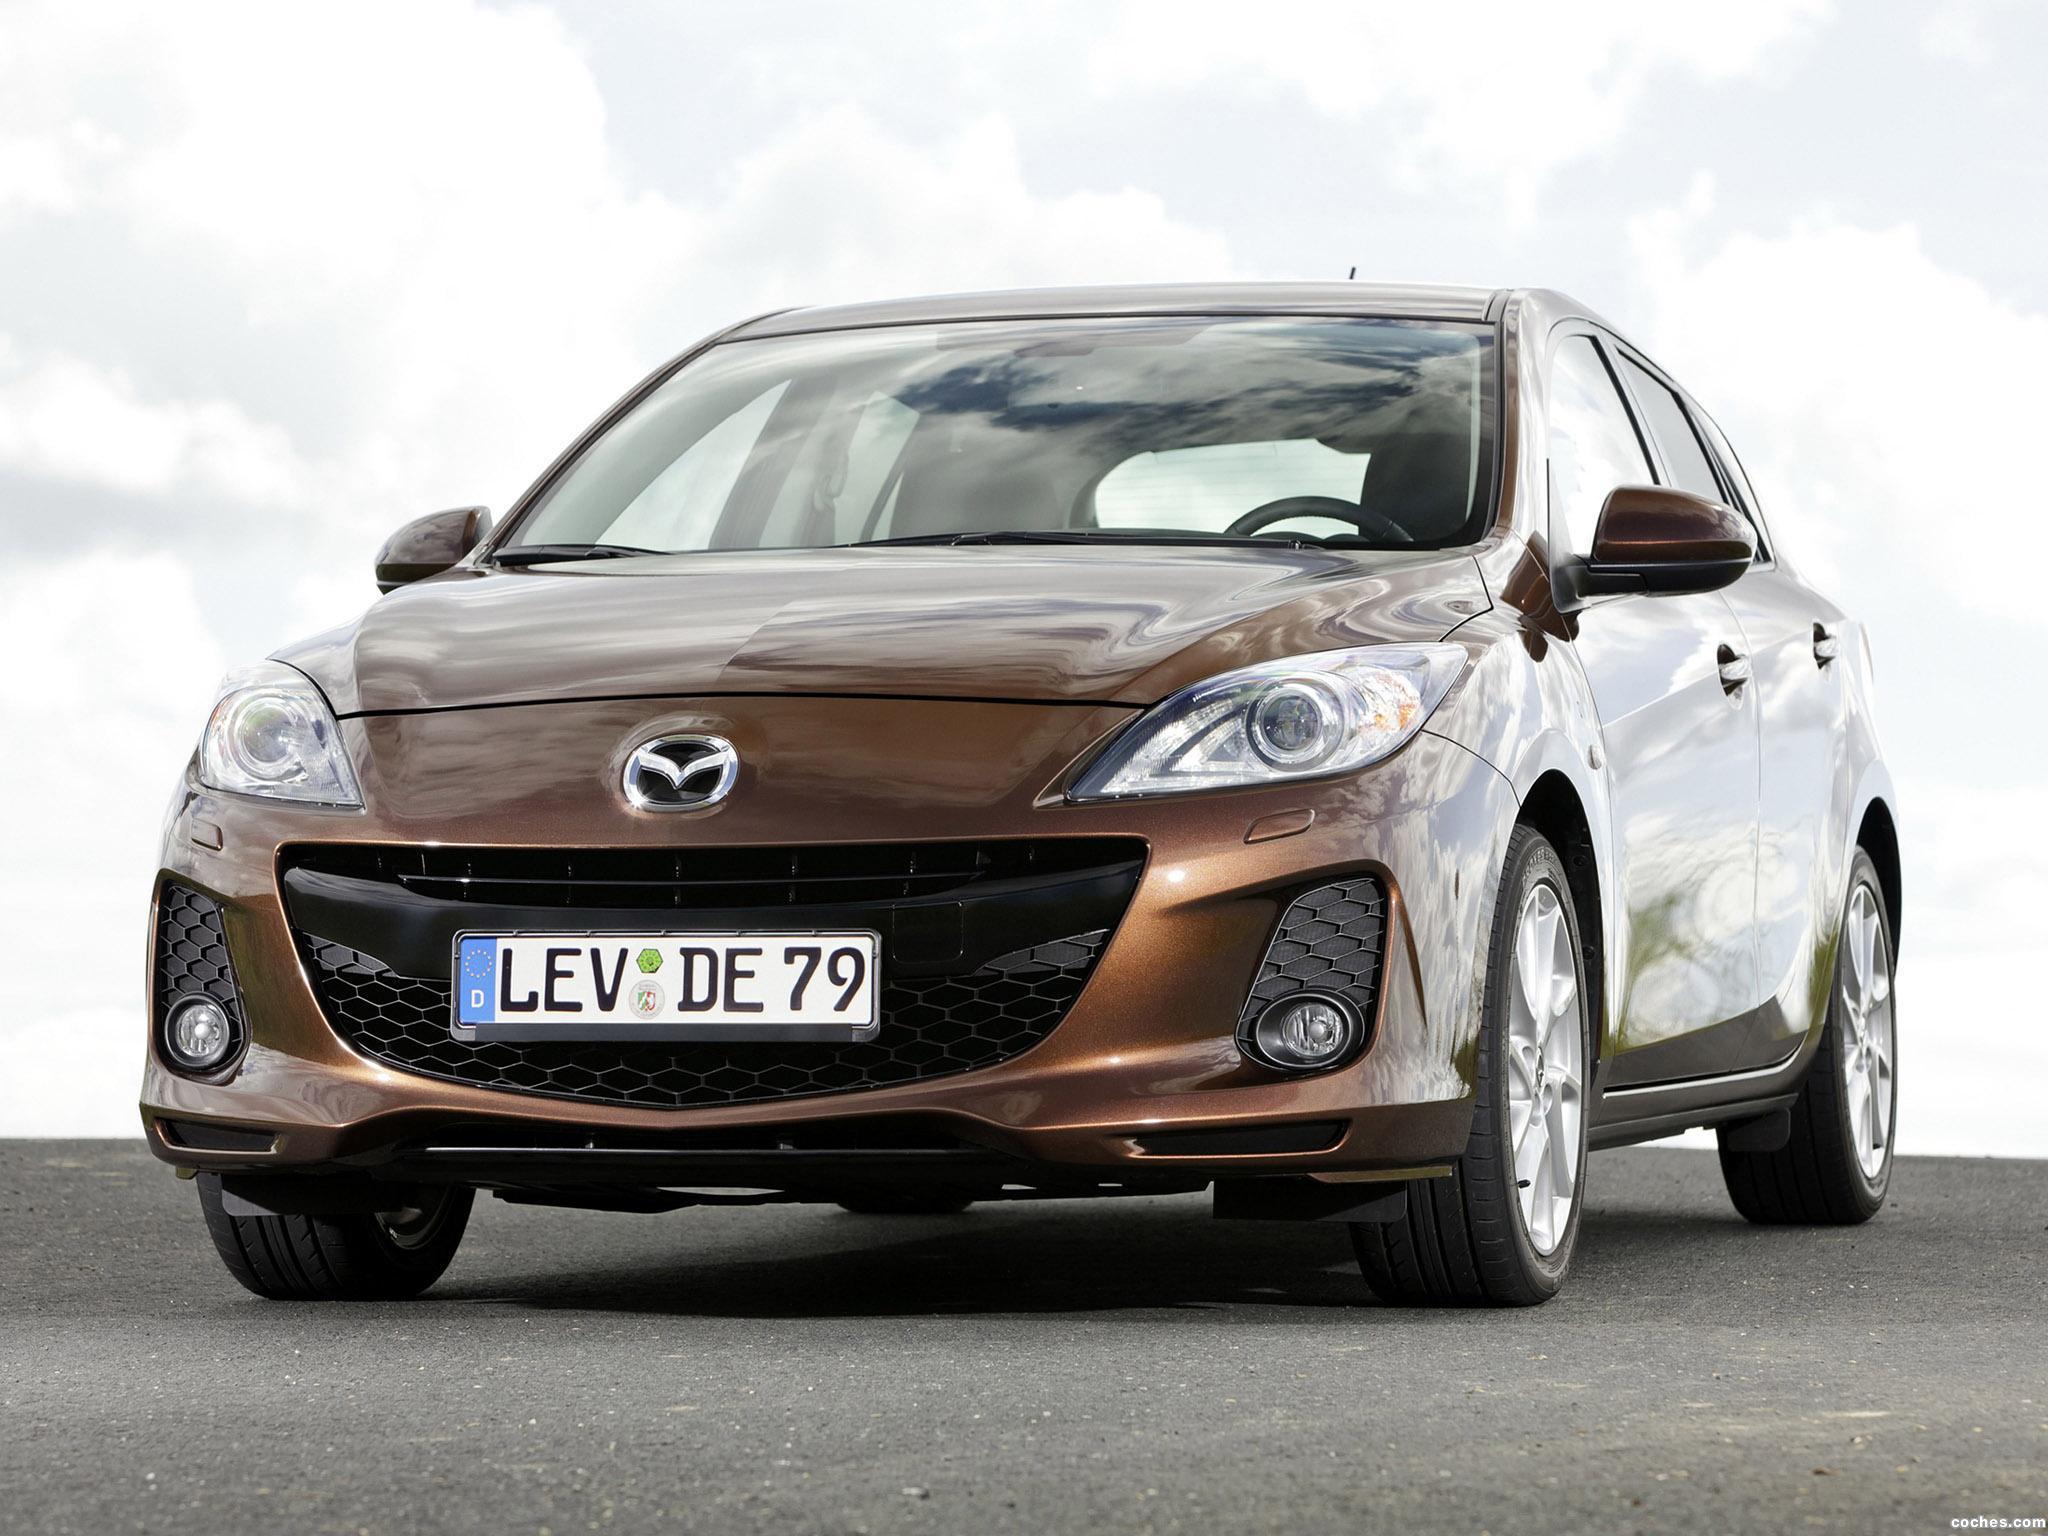 Foto 0 de Mazda 3 Hatchback Europa 2011